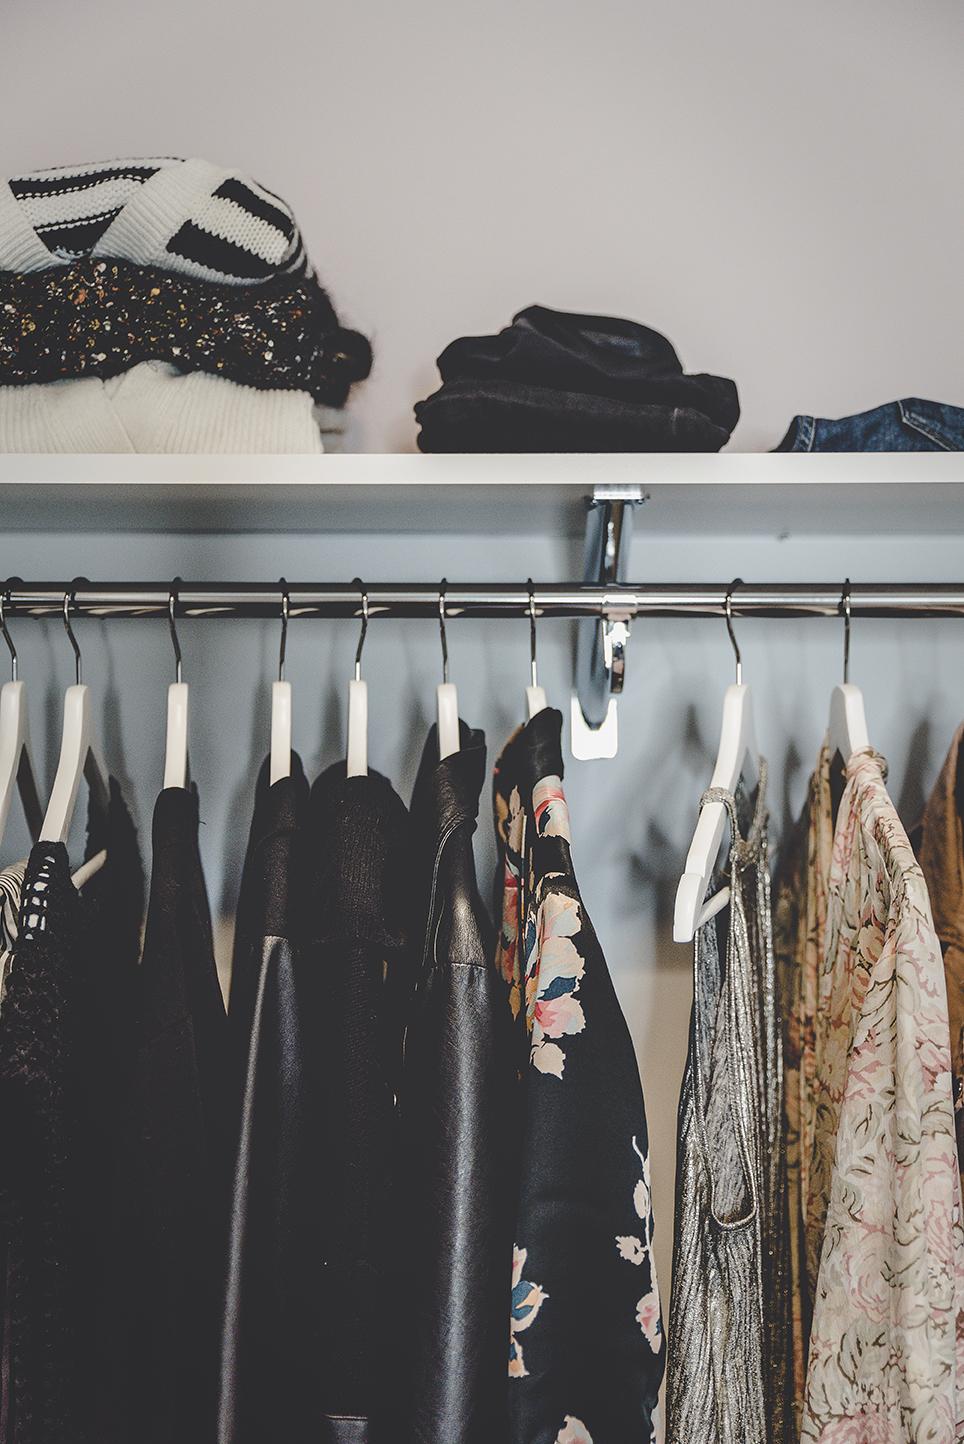 steph_closet_teasers_001.jpg